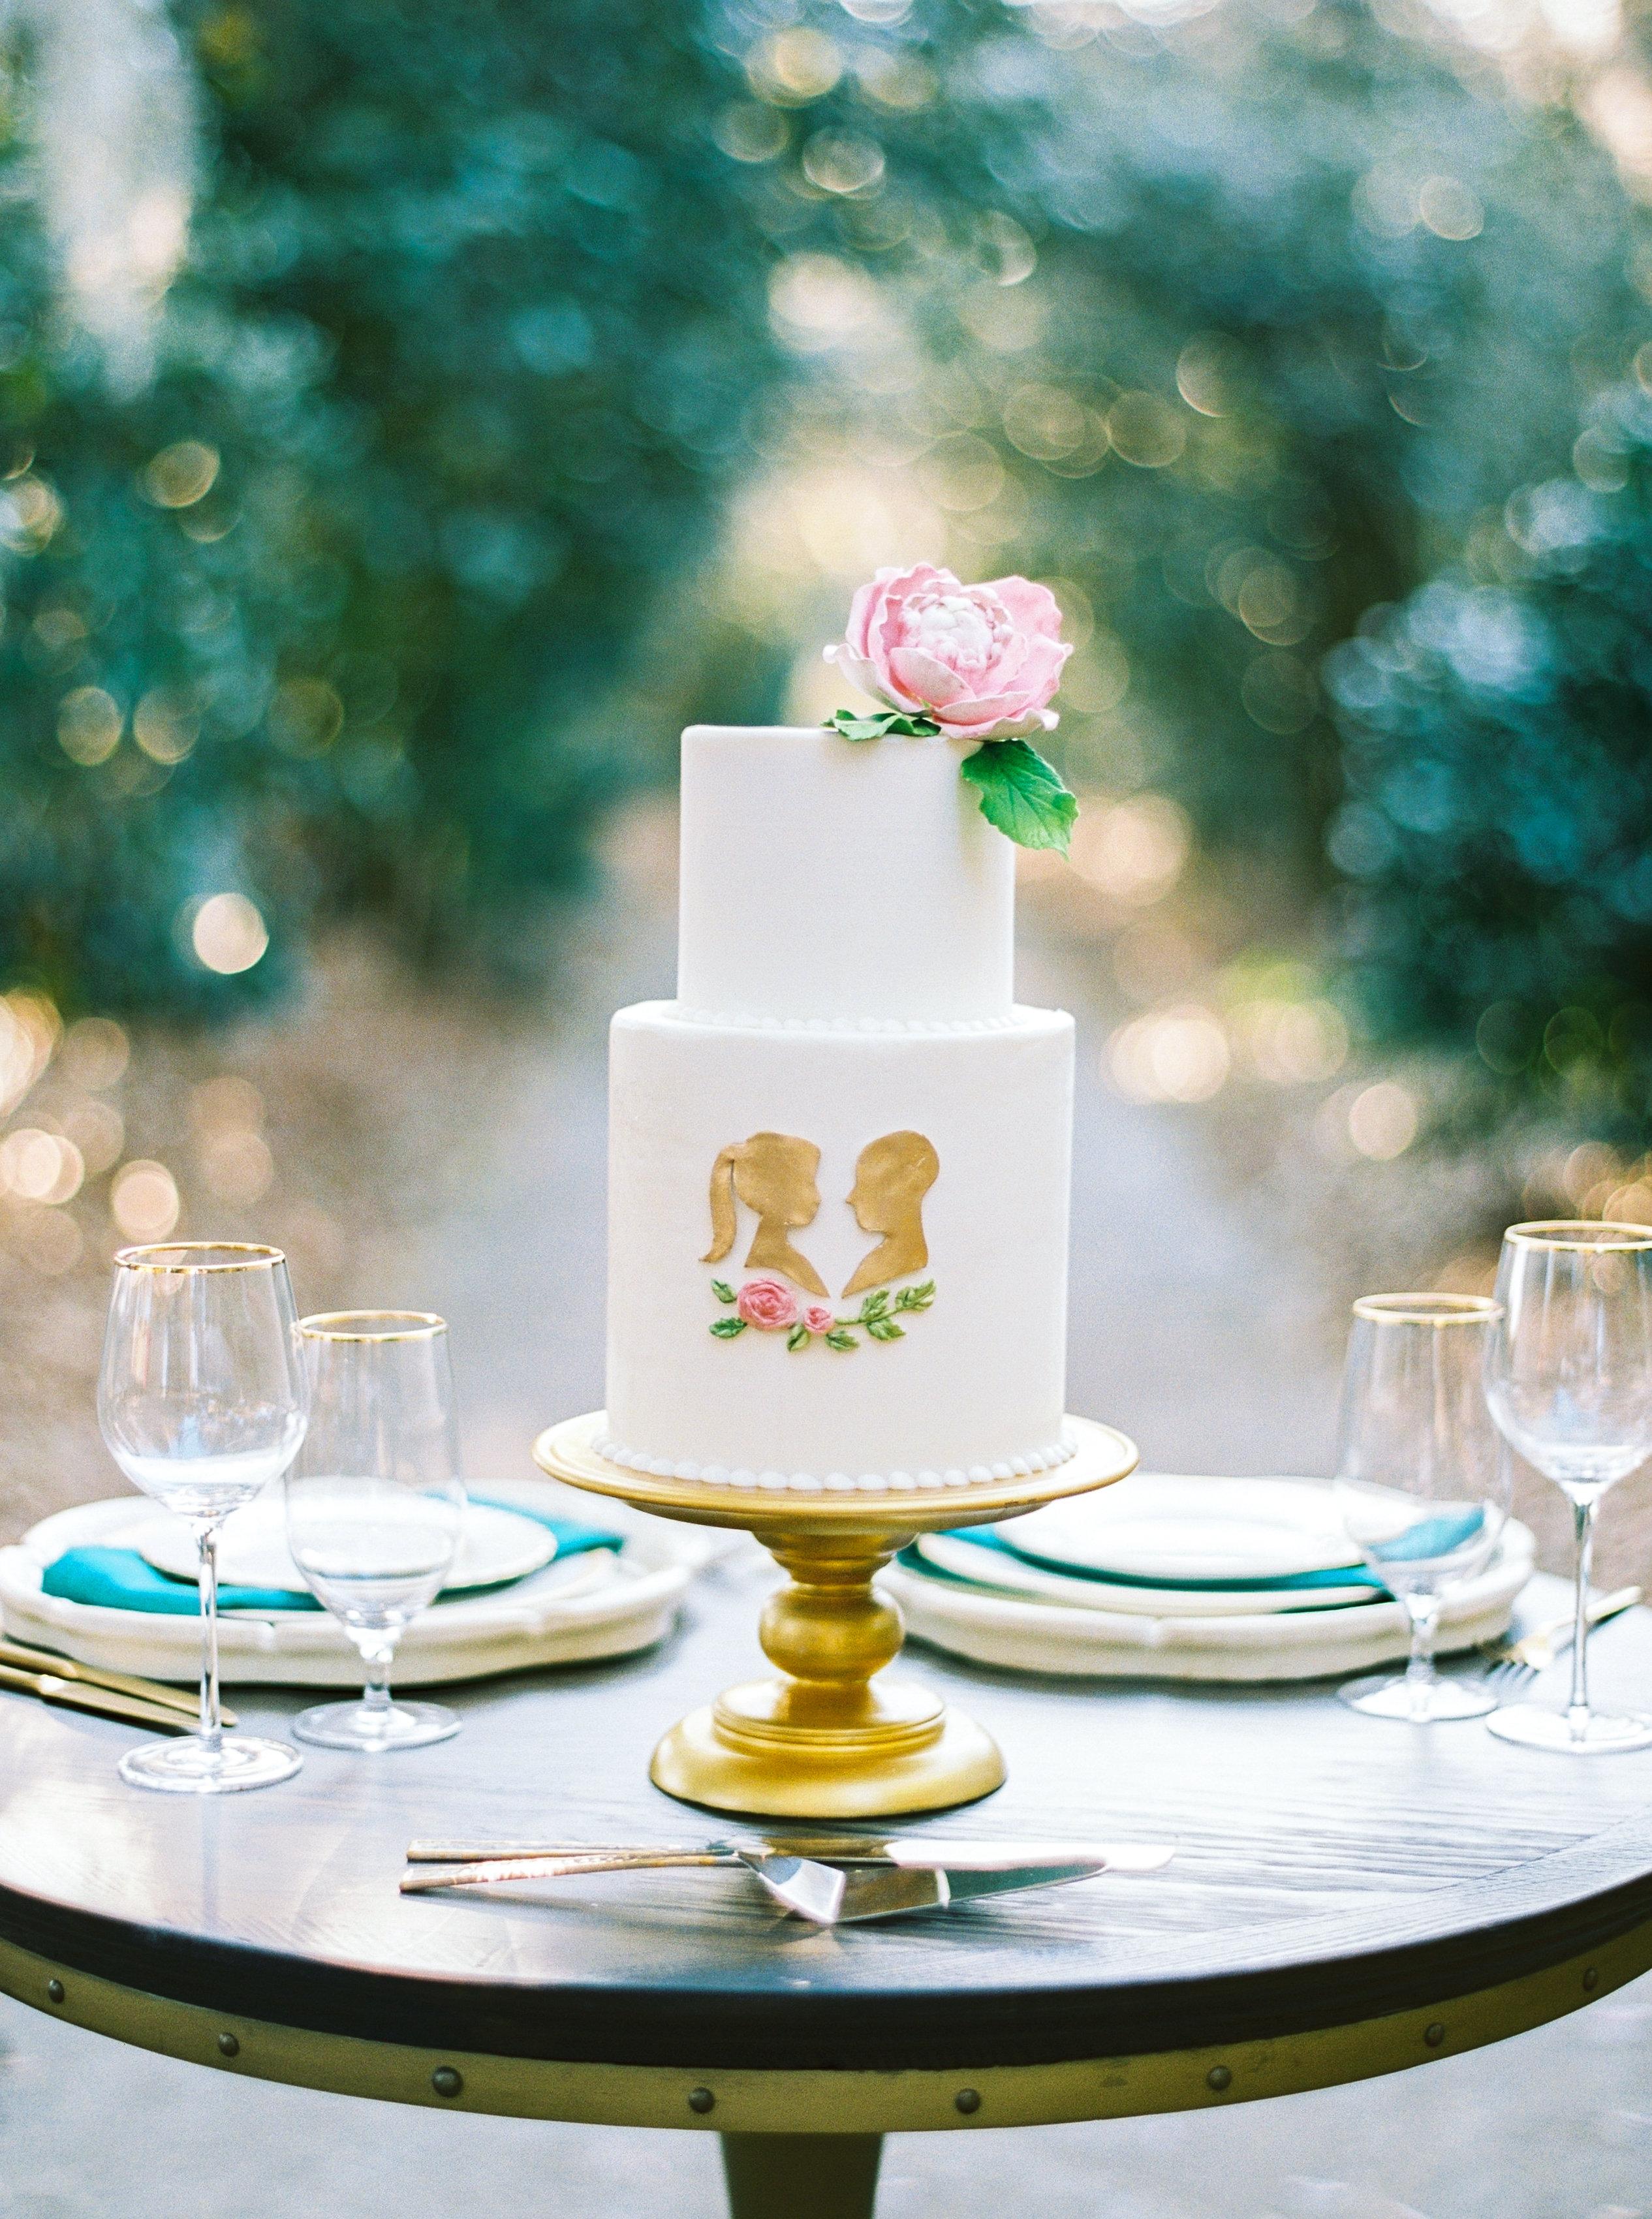 catherine john micro wedding cakes perry vaile